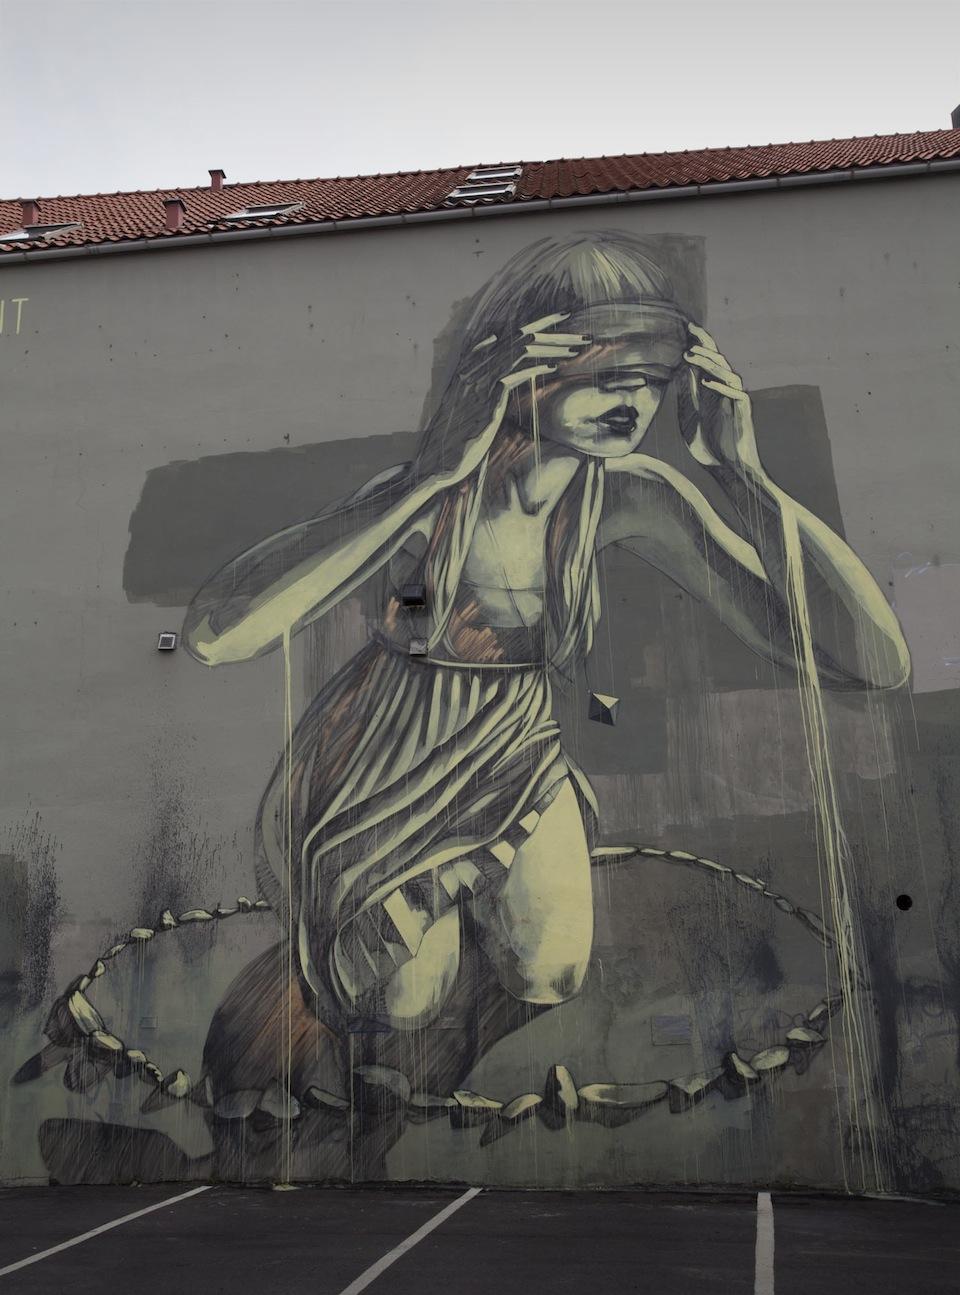 Street Art by faith47 at Nuart in Stavanger, Norway 2